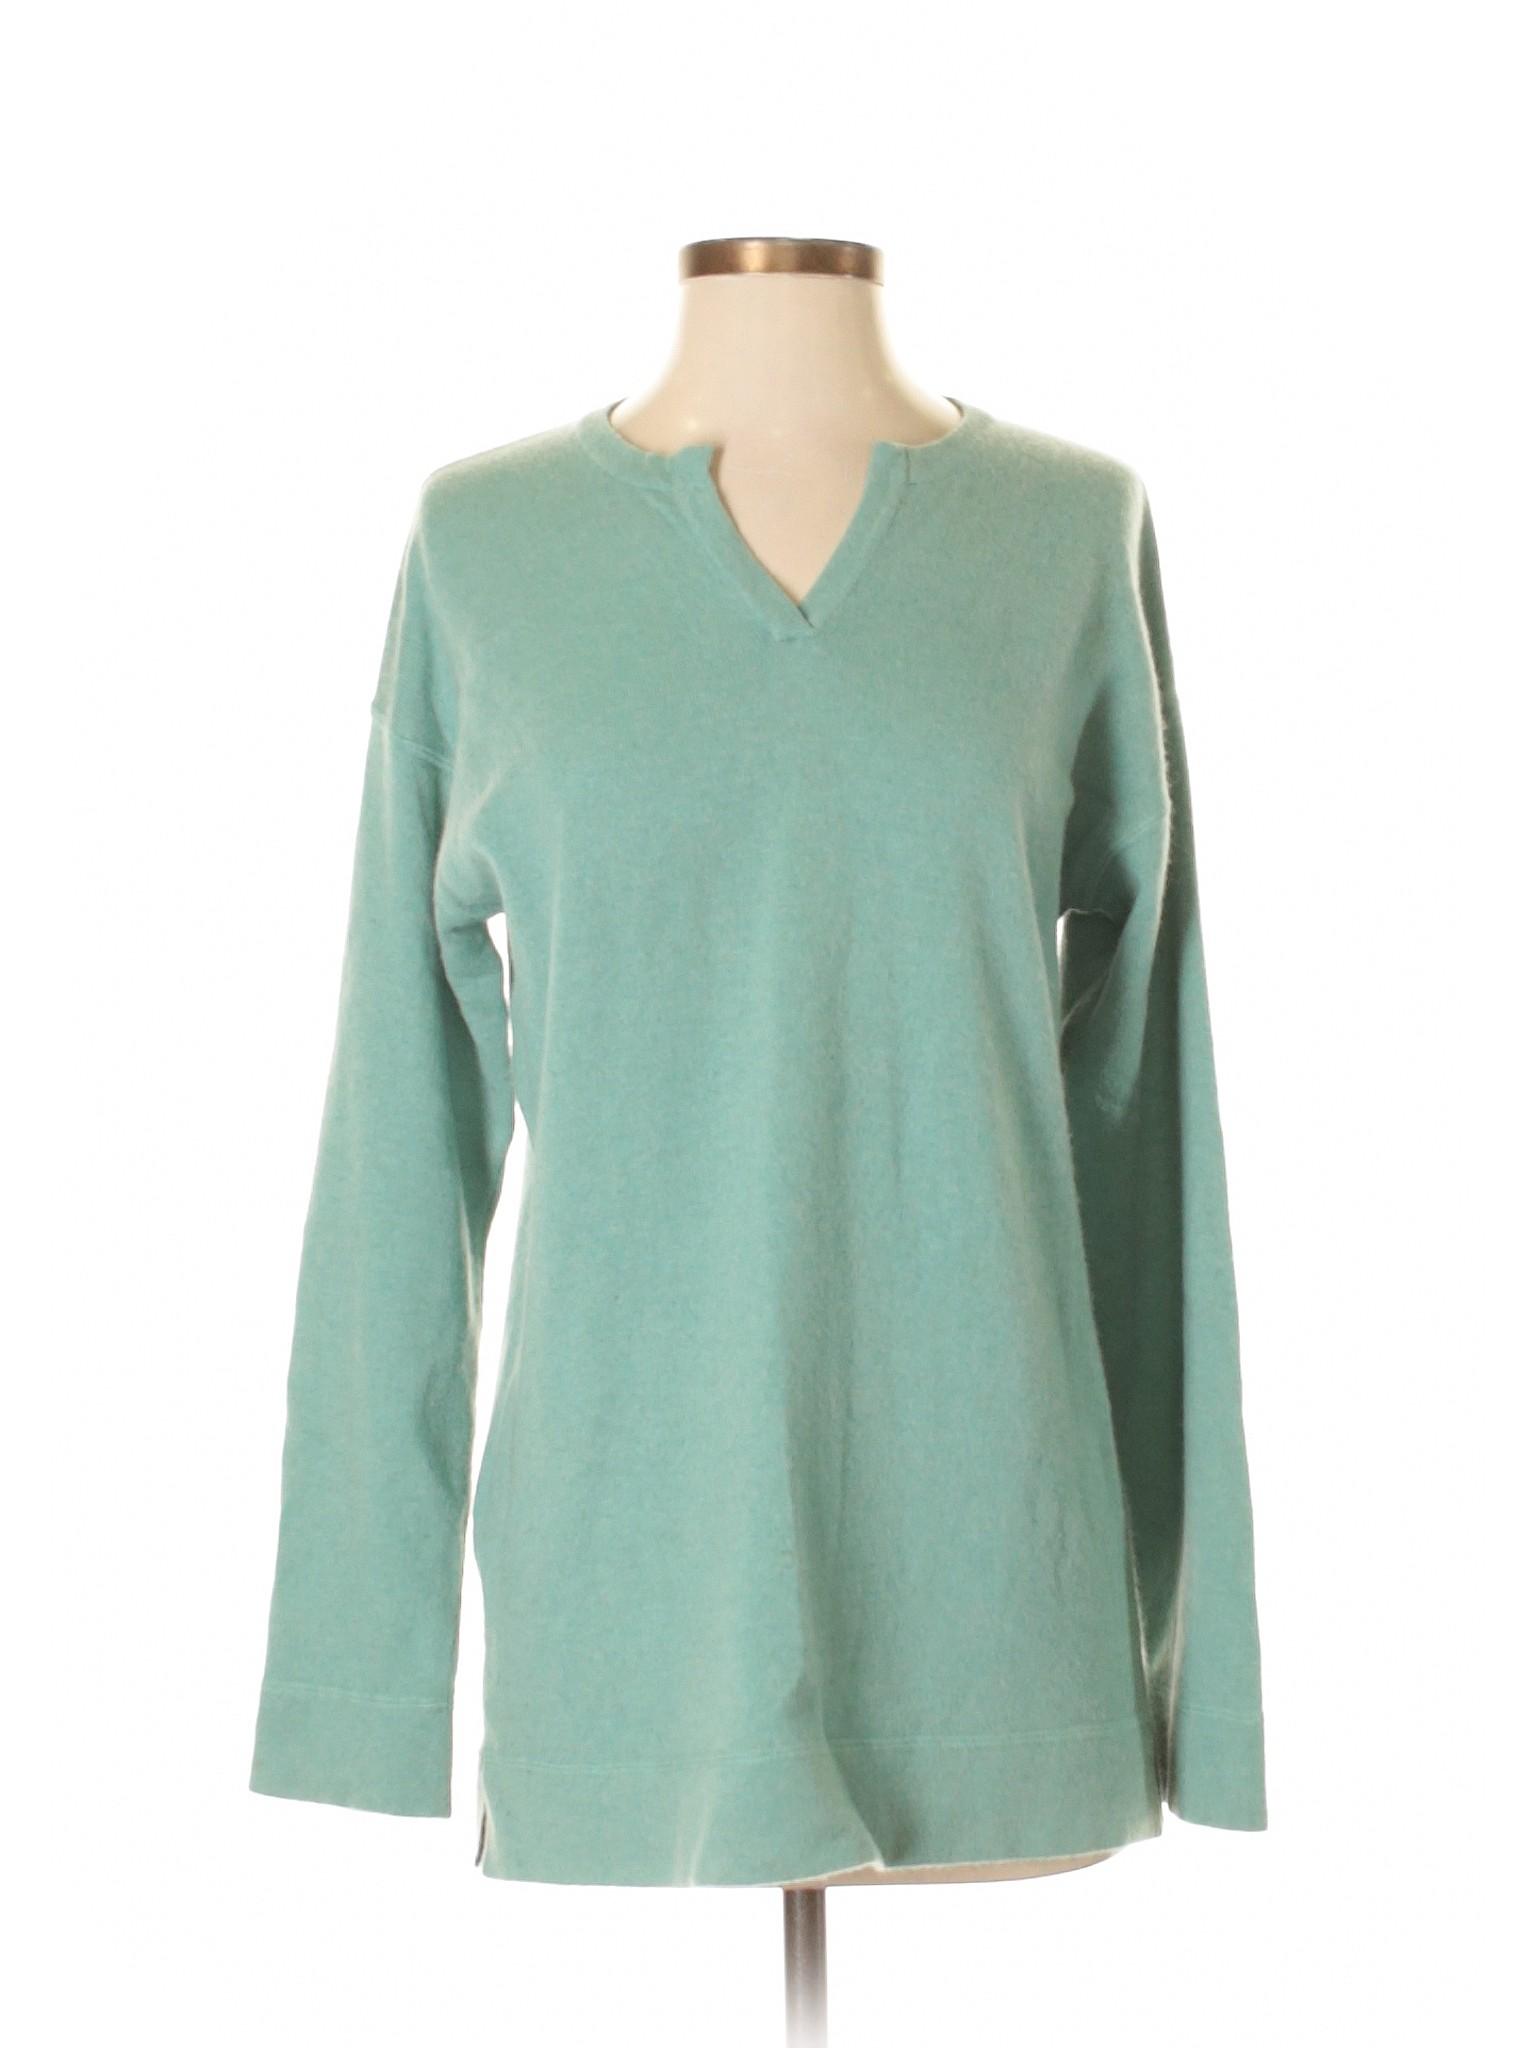 Cashmere Sweater Boutique Pullover Cashmere LXRI 178wfqTS